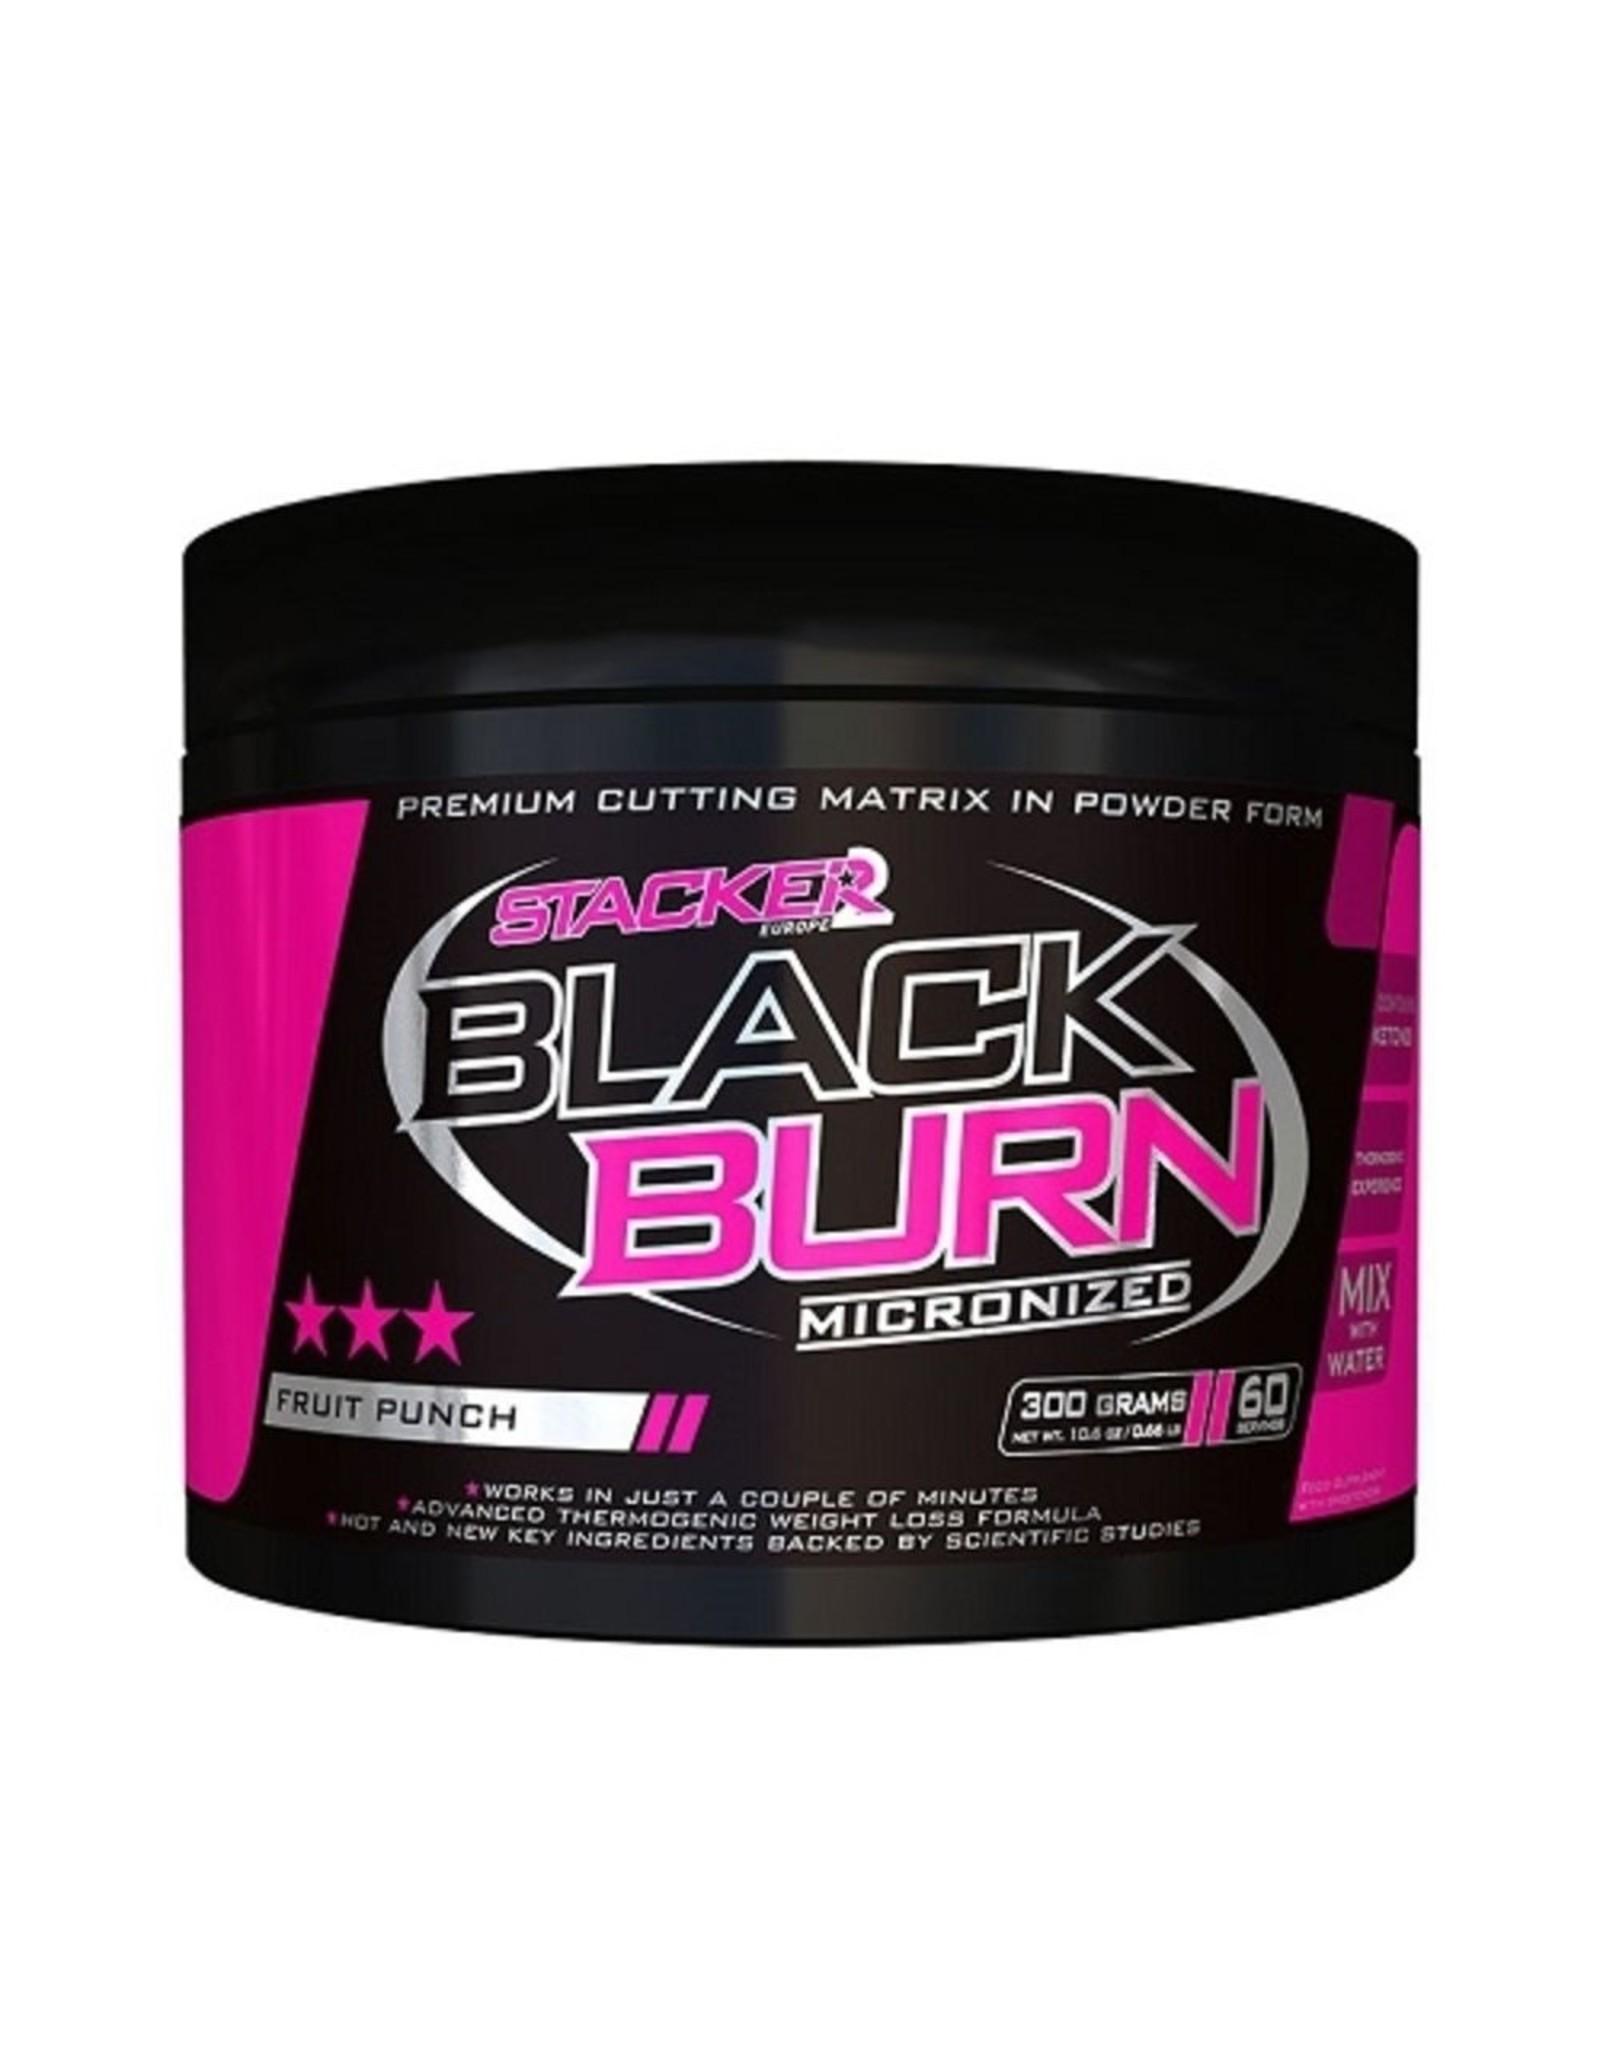 STACKER 2 Black Burn Micronized